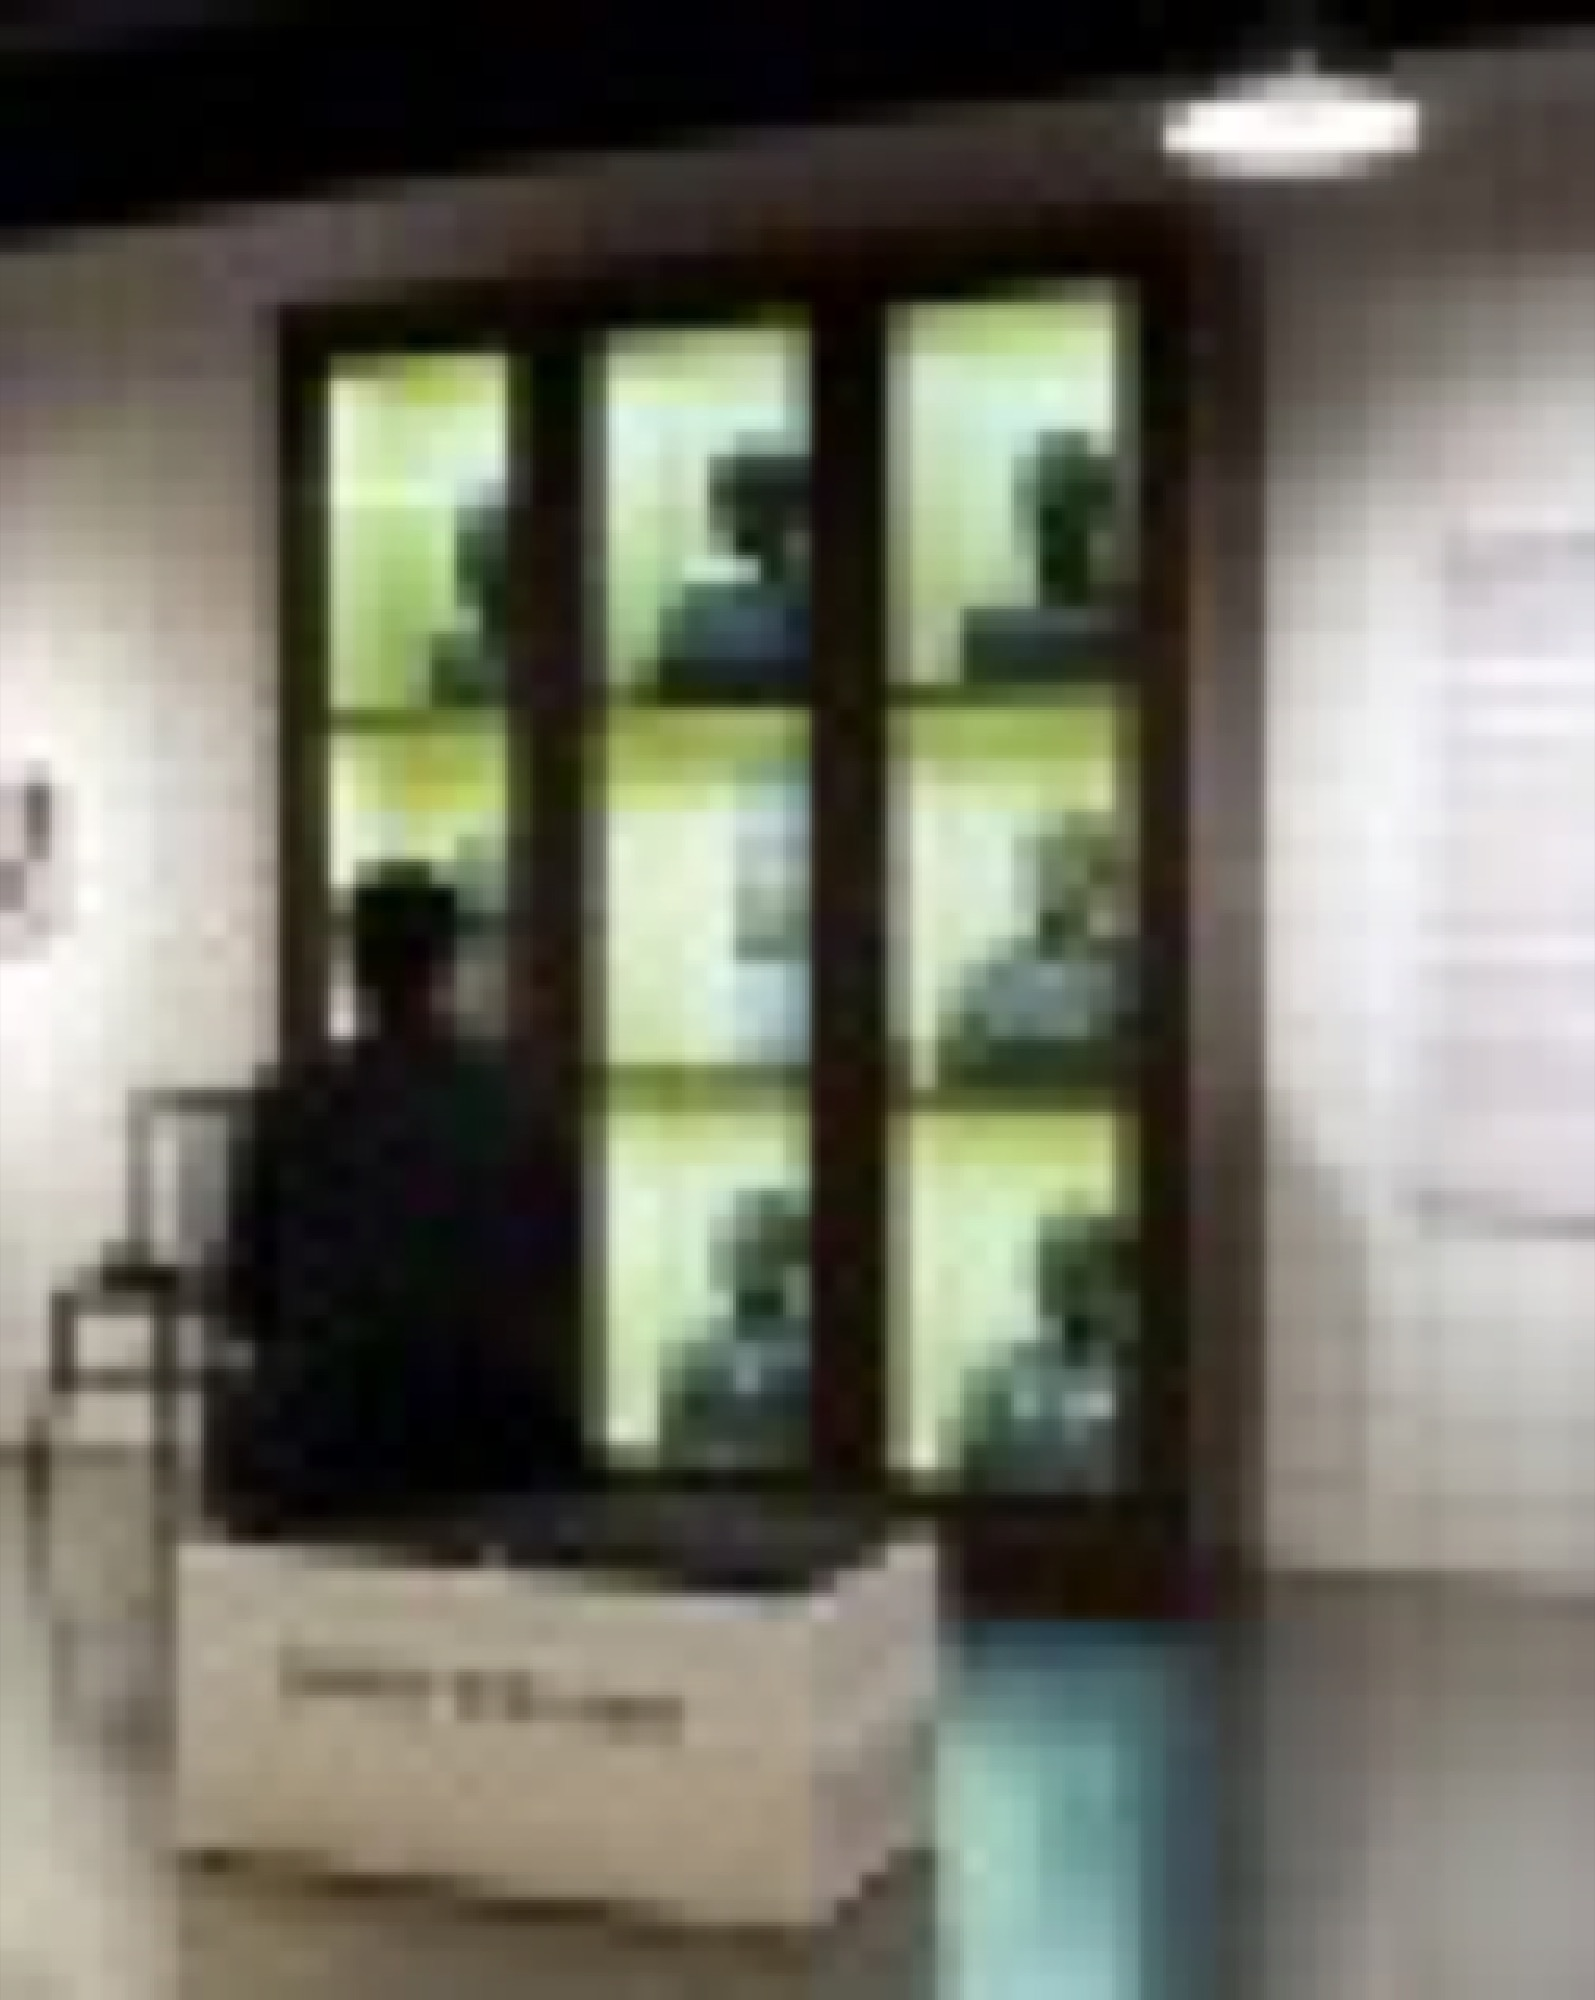 etnografiskamuseet